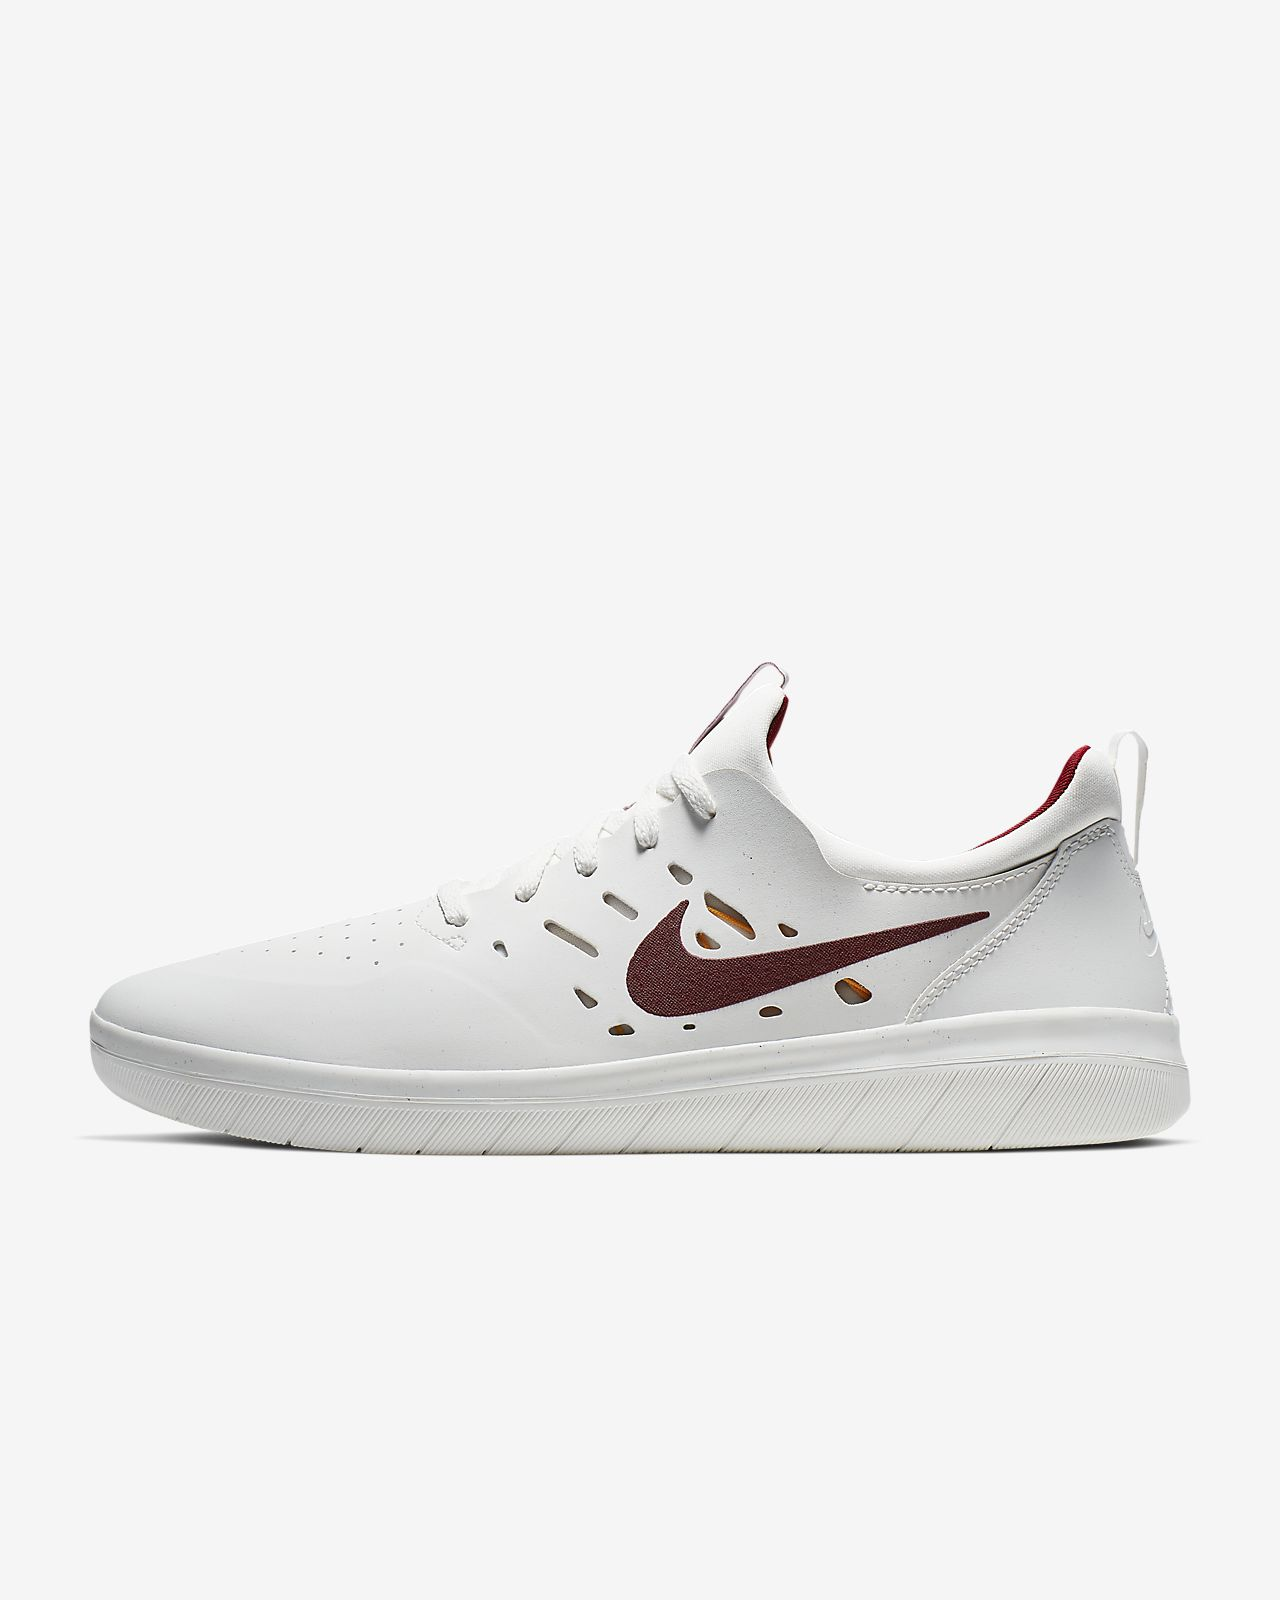 69826cee5149 Calzado de skateboarding Nike SB Nyjah Free. Nike.com CL